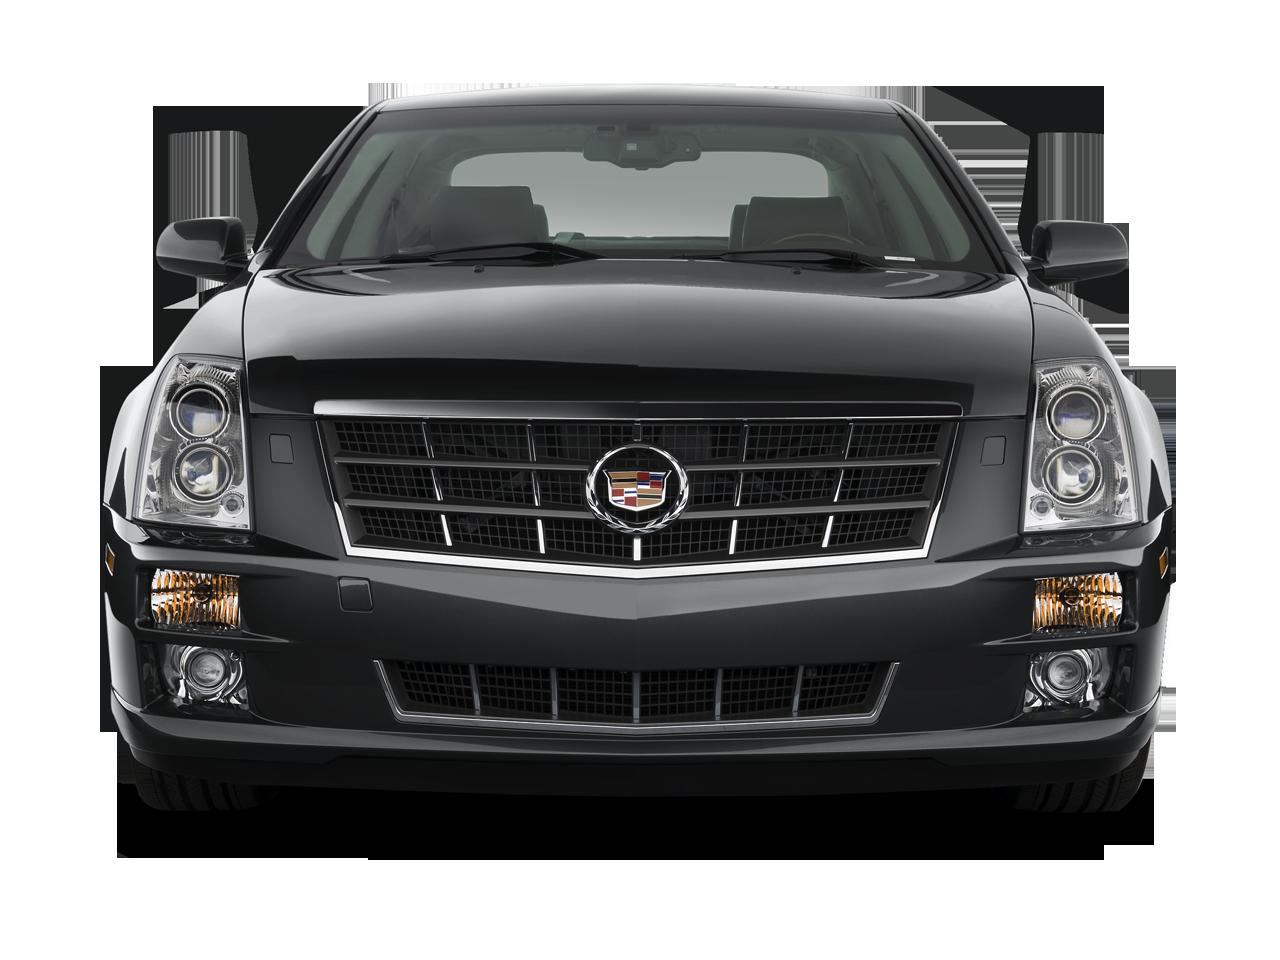 Cadillac Ties Lexus in Annual Customer Satisfaction Survey